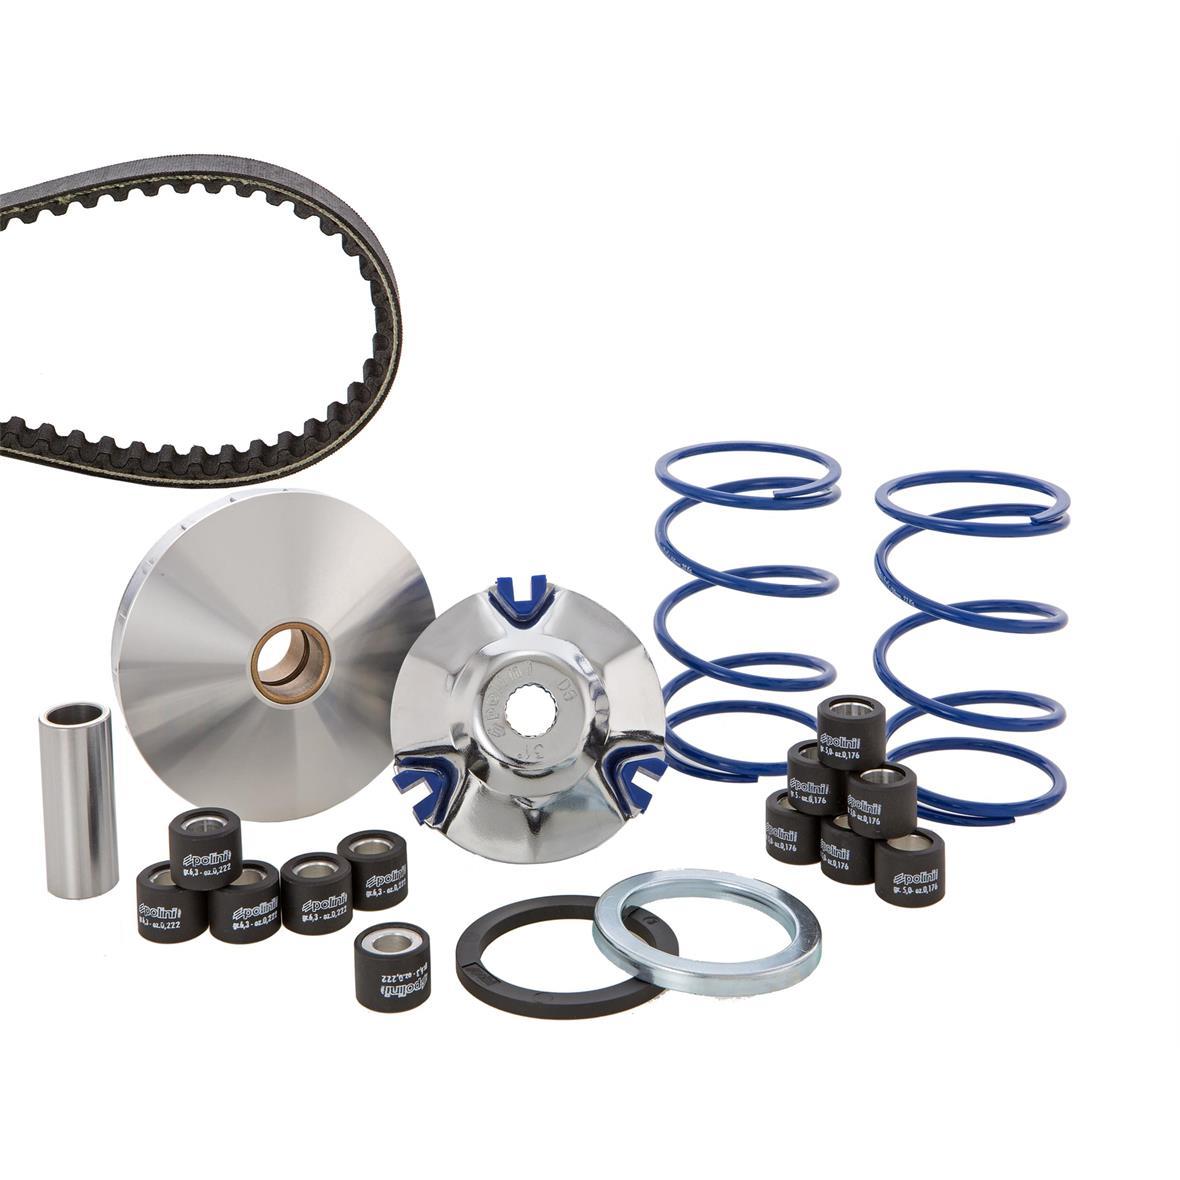 Product Image for 'Variator Kit POLINI Hi-SpeedTitle'